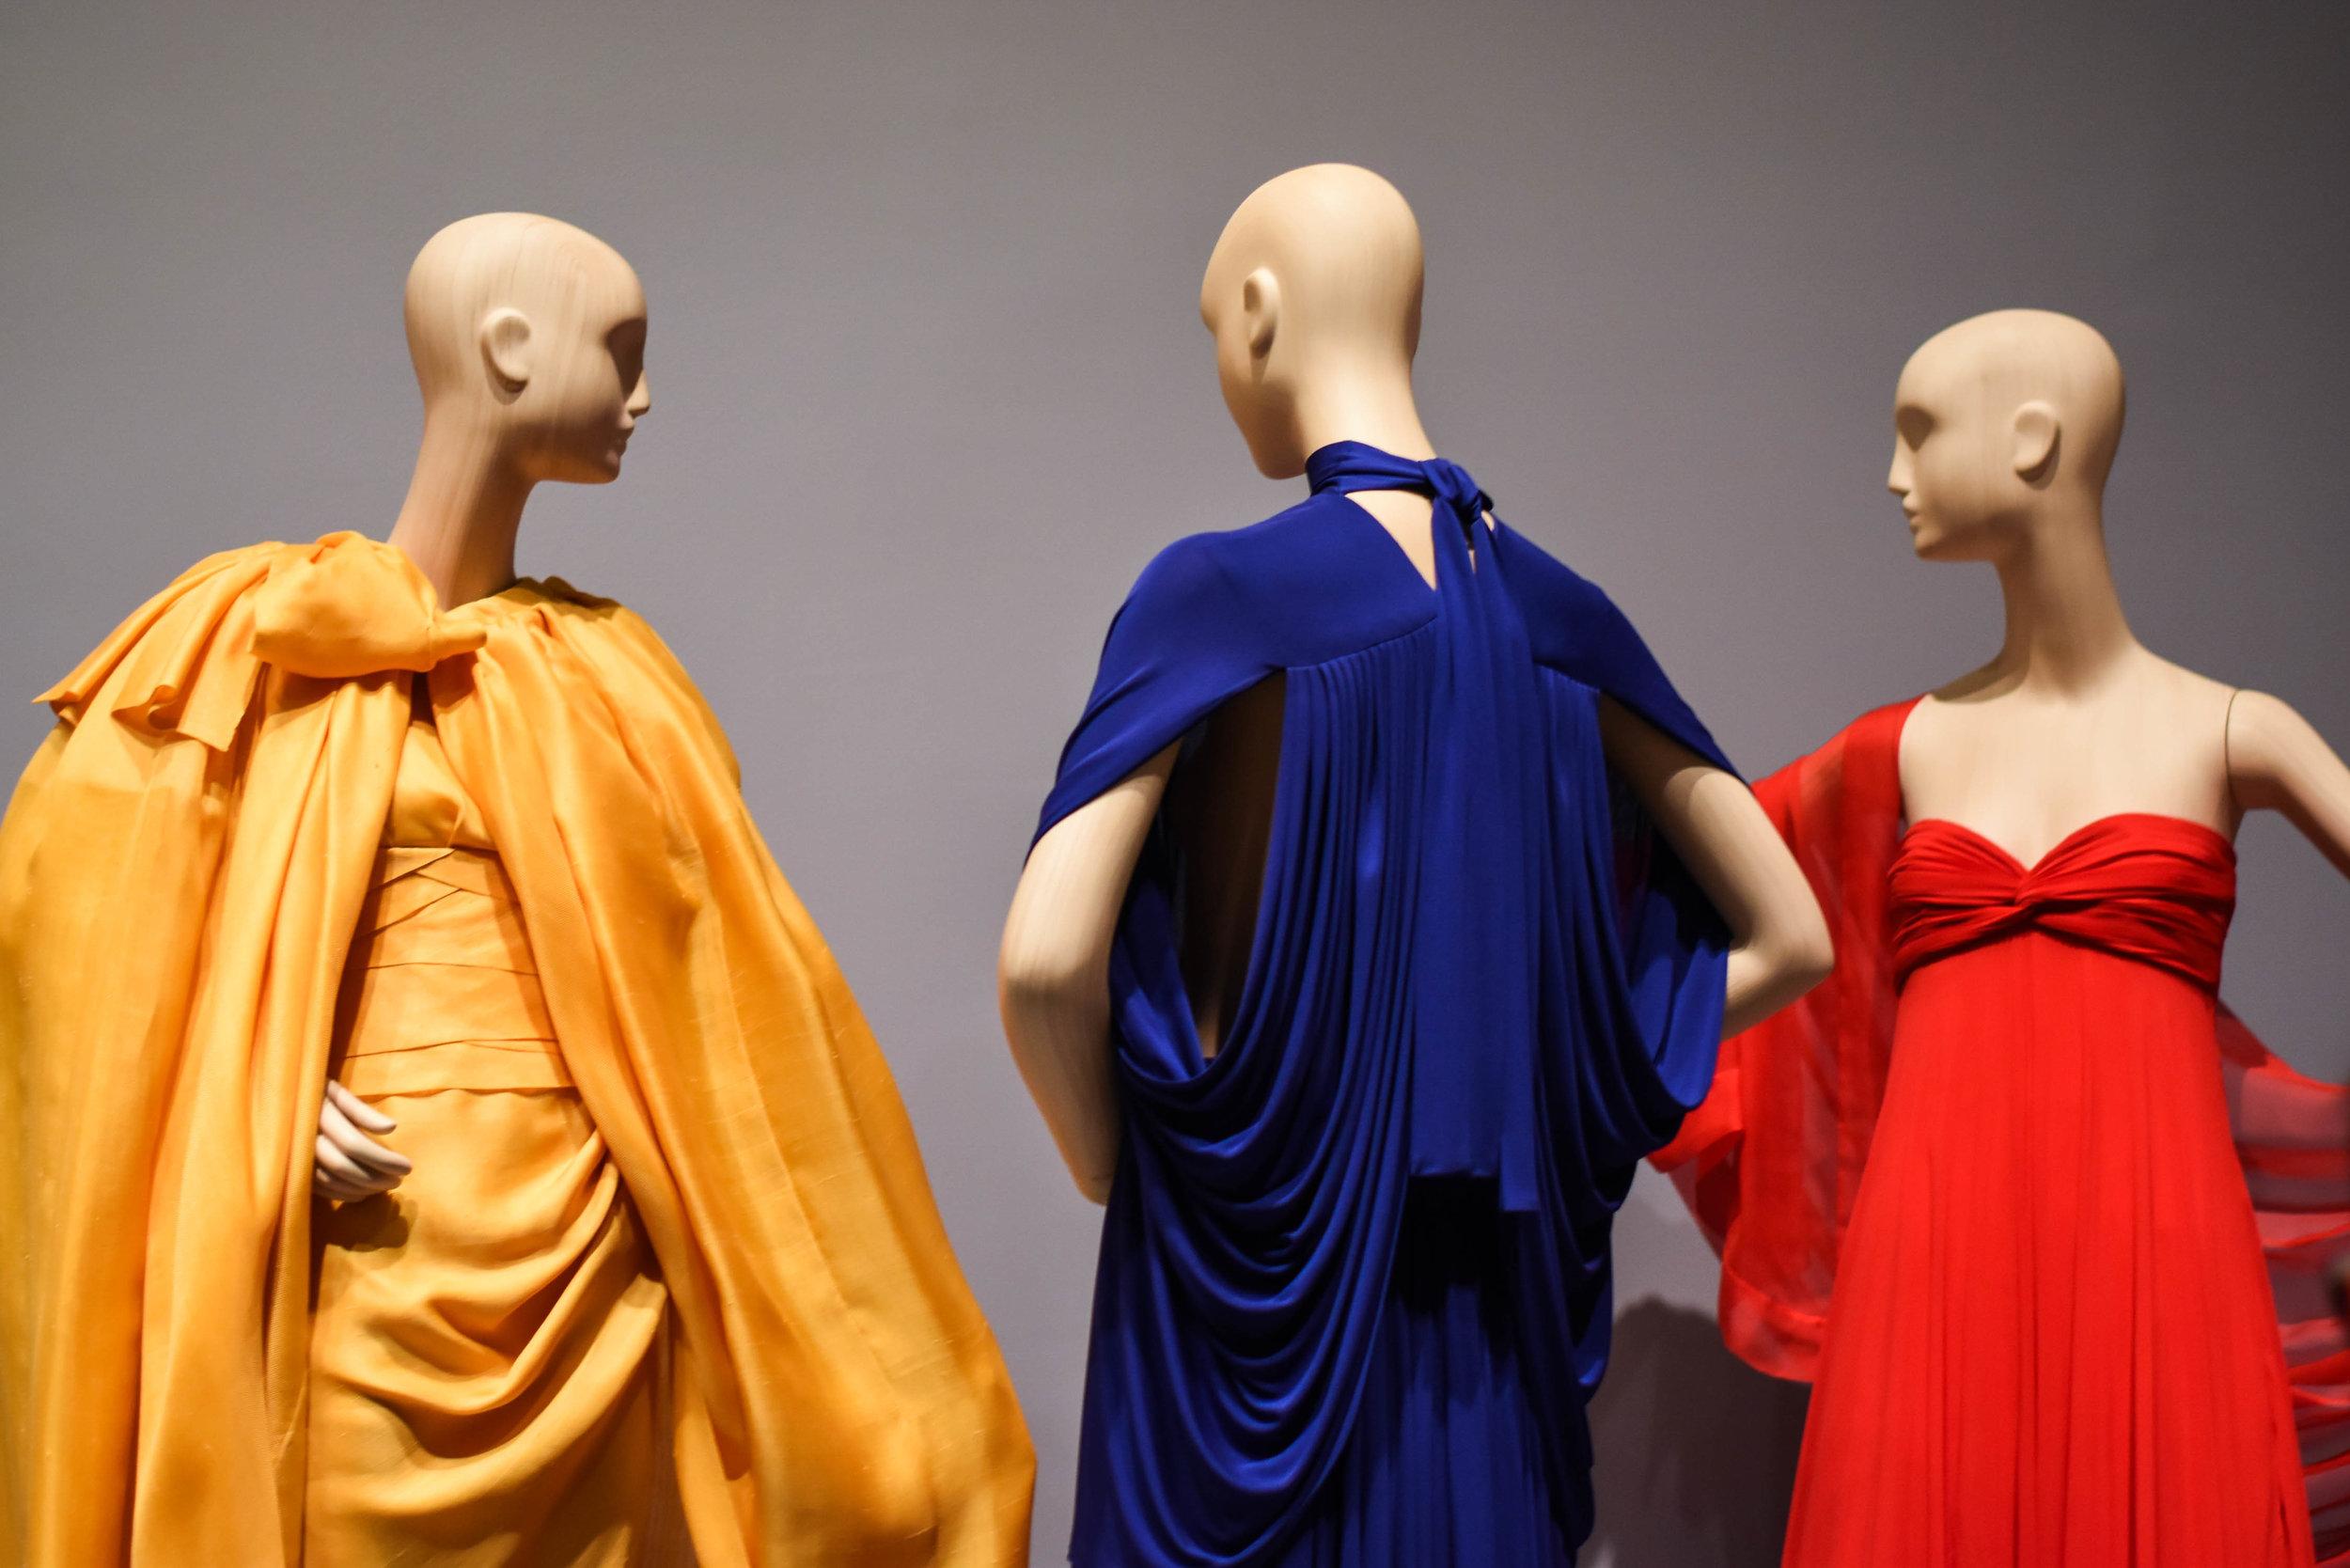 designed by Marc Bohan for Christian Dior